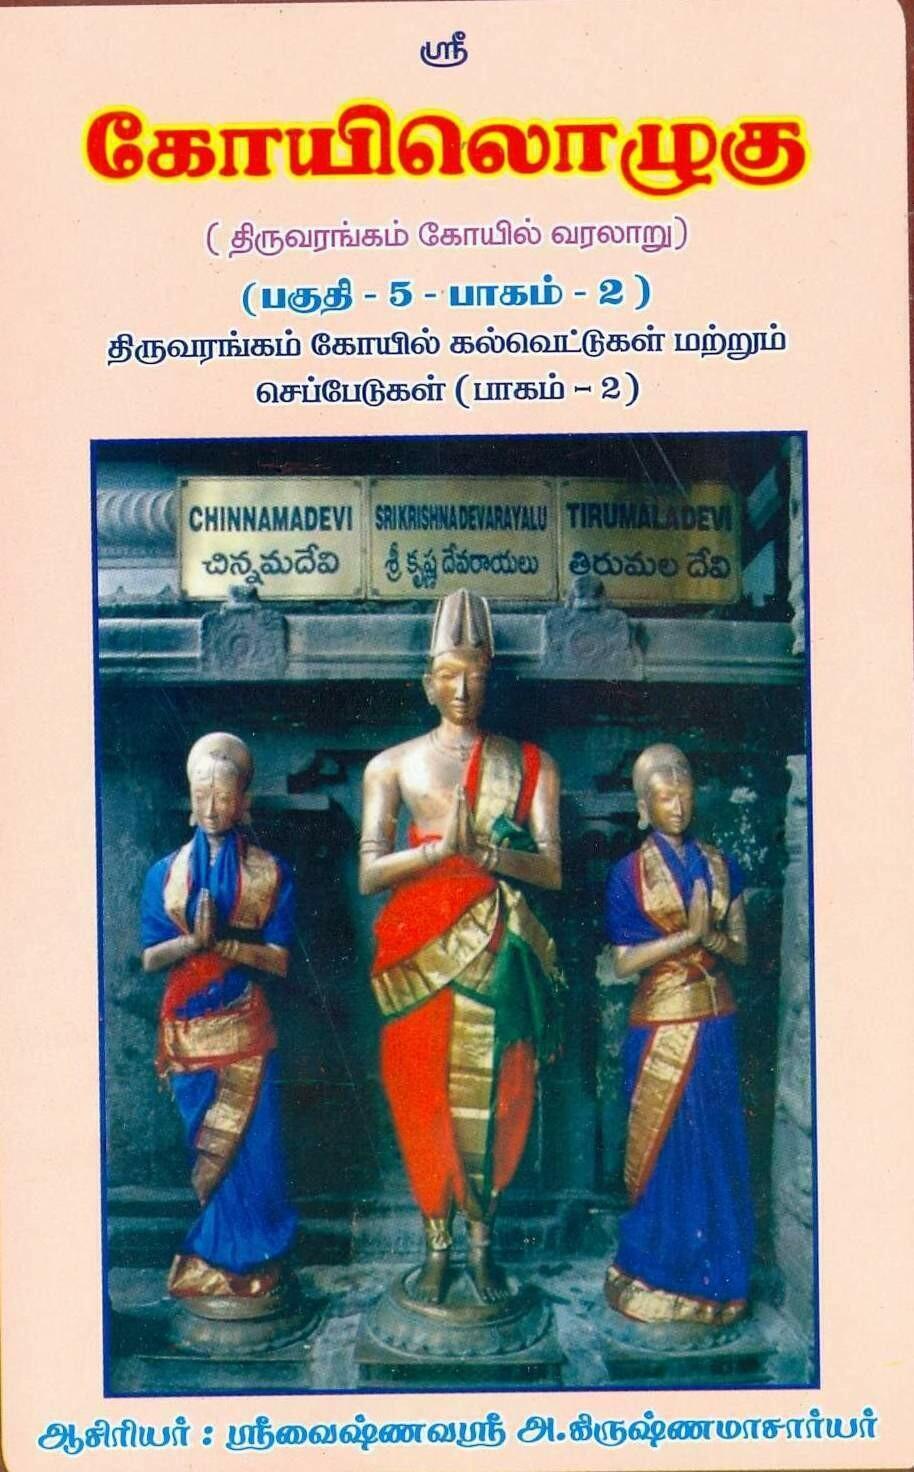 E Book Koil Ozhugu / Koilozhugu 5 - Vol 2 ; Srirangam Inscriptions number 283 - 644, கோயில் ஒழுகு பாகம் 5, பகுதி 2 கல்வெட்டுப் பகுதி